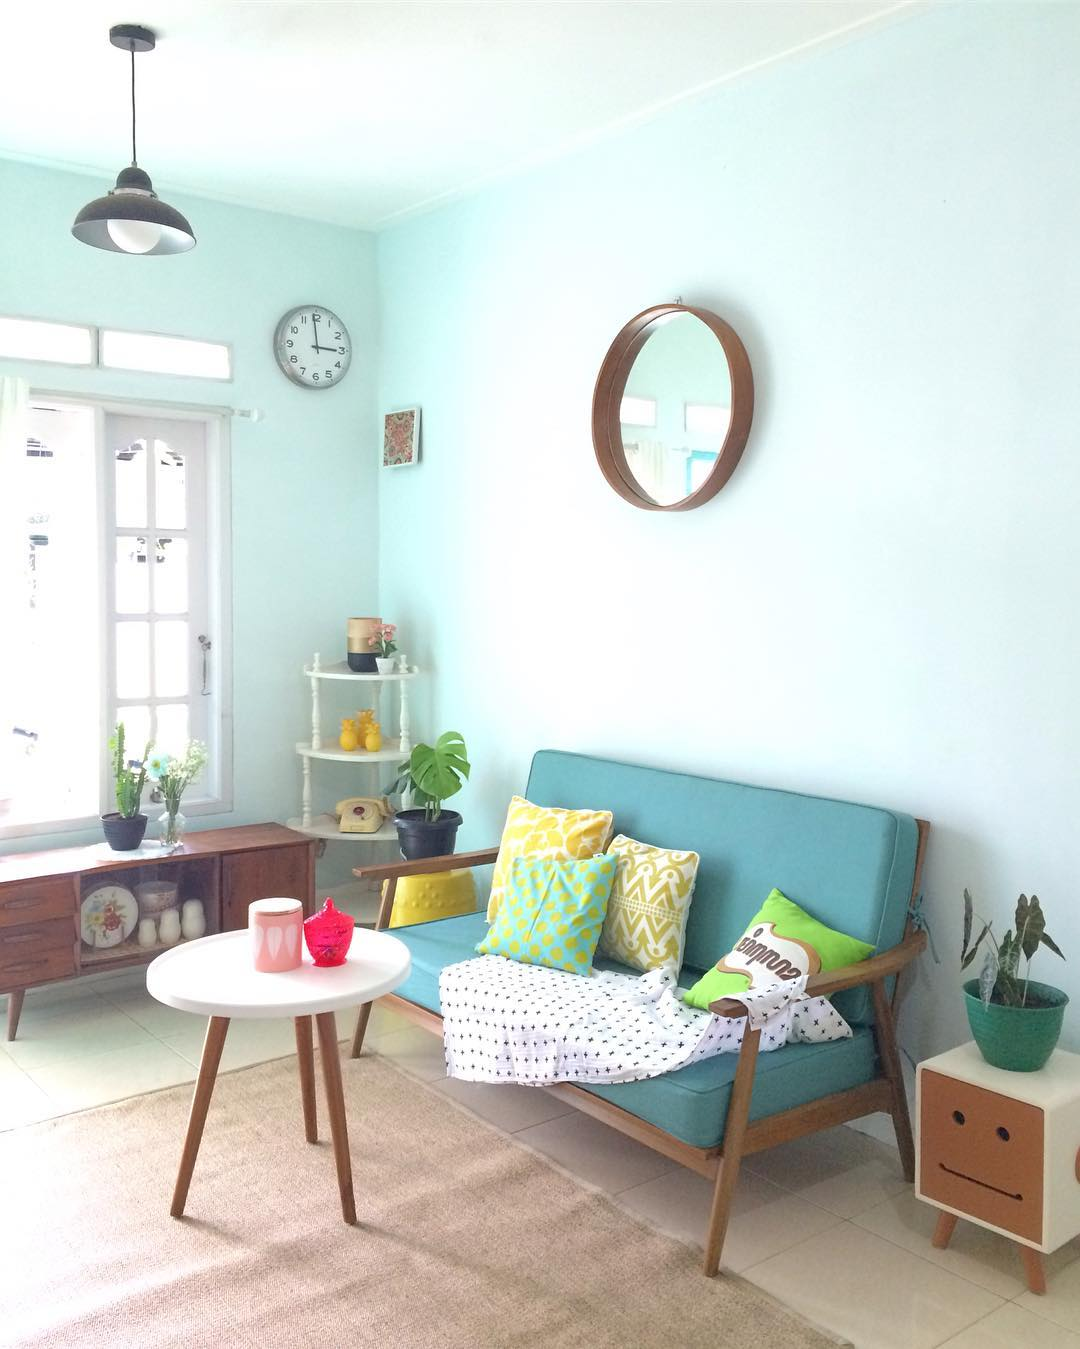 12 ide dan cara menata ruang tamu minimalis makin cantik